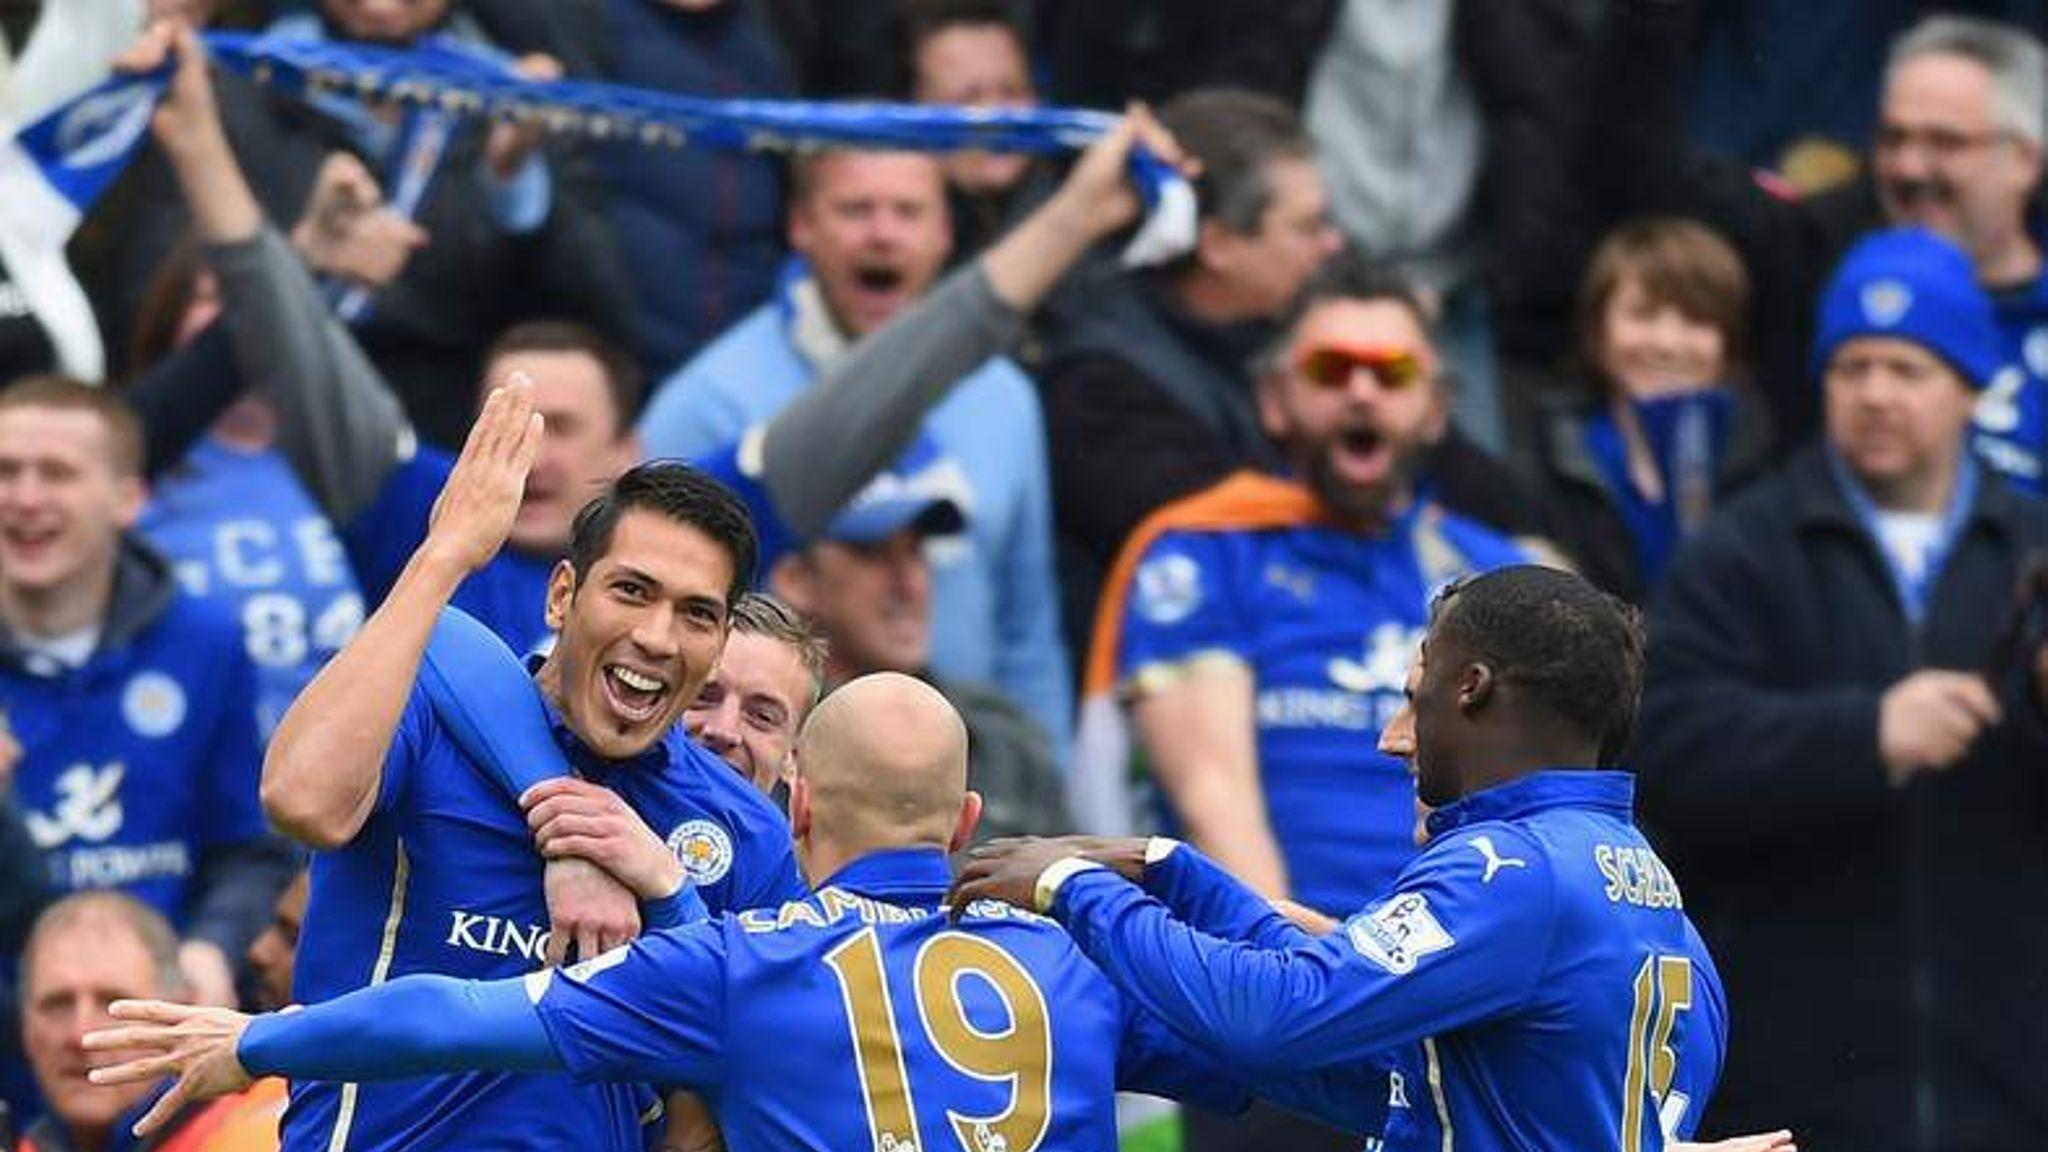 Vital Wins For Villa Sunderland Leicester Scoop News Sky News 2048x1152